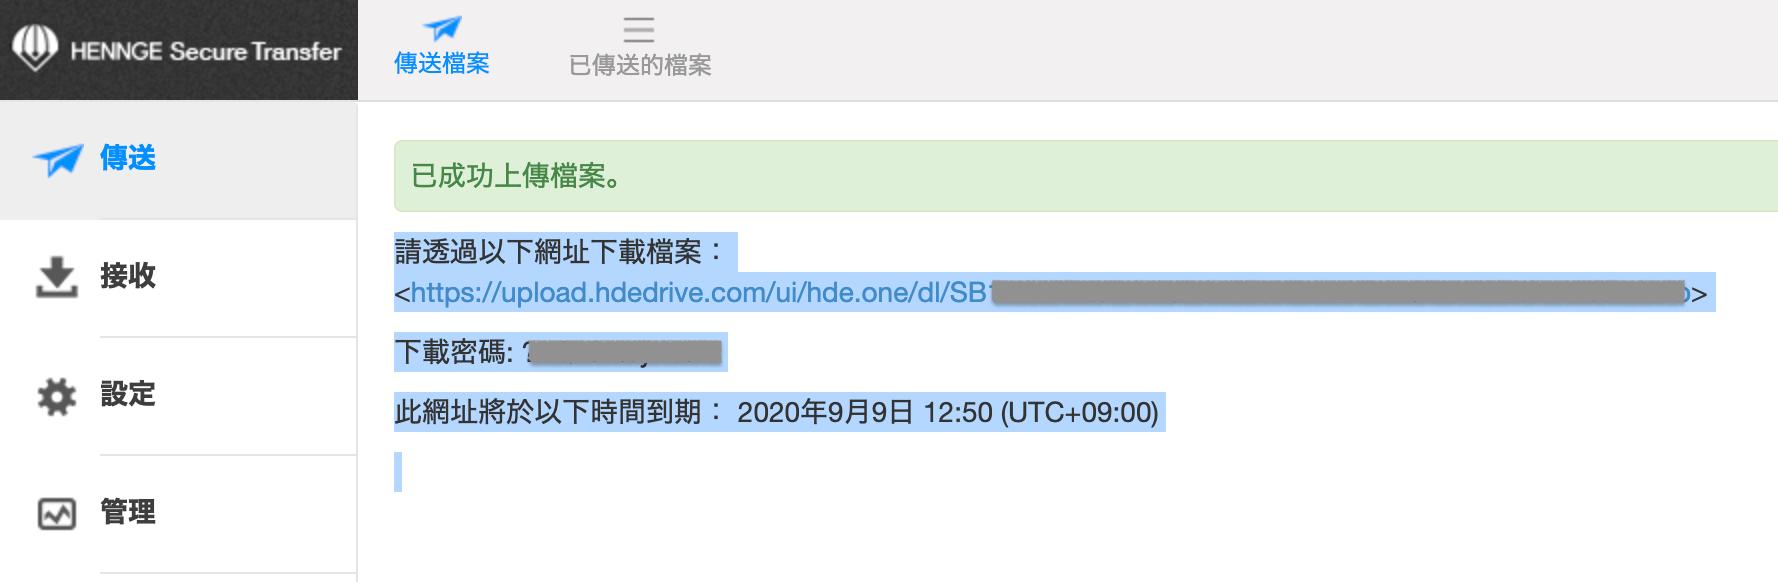 900002322843_userUI_sample_tw.png